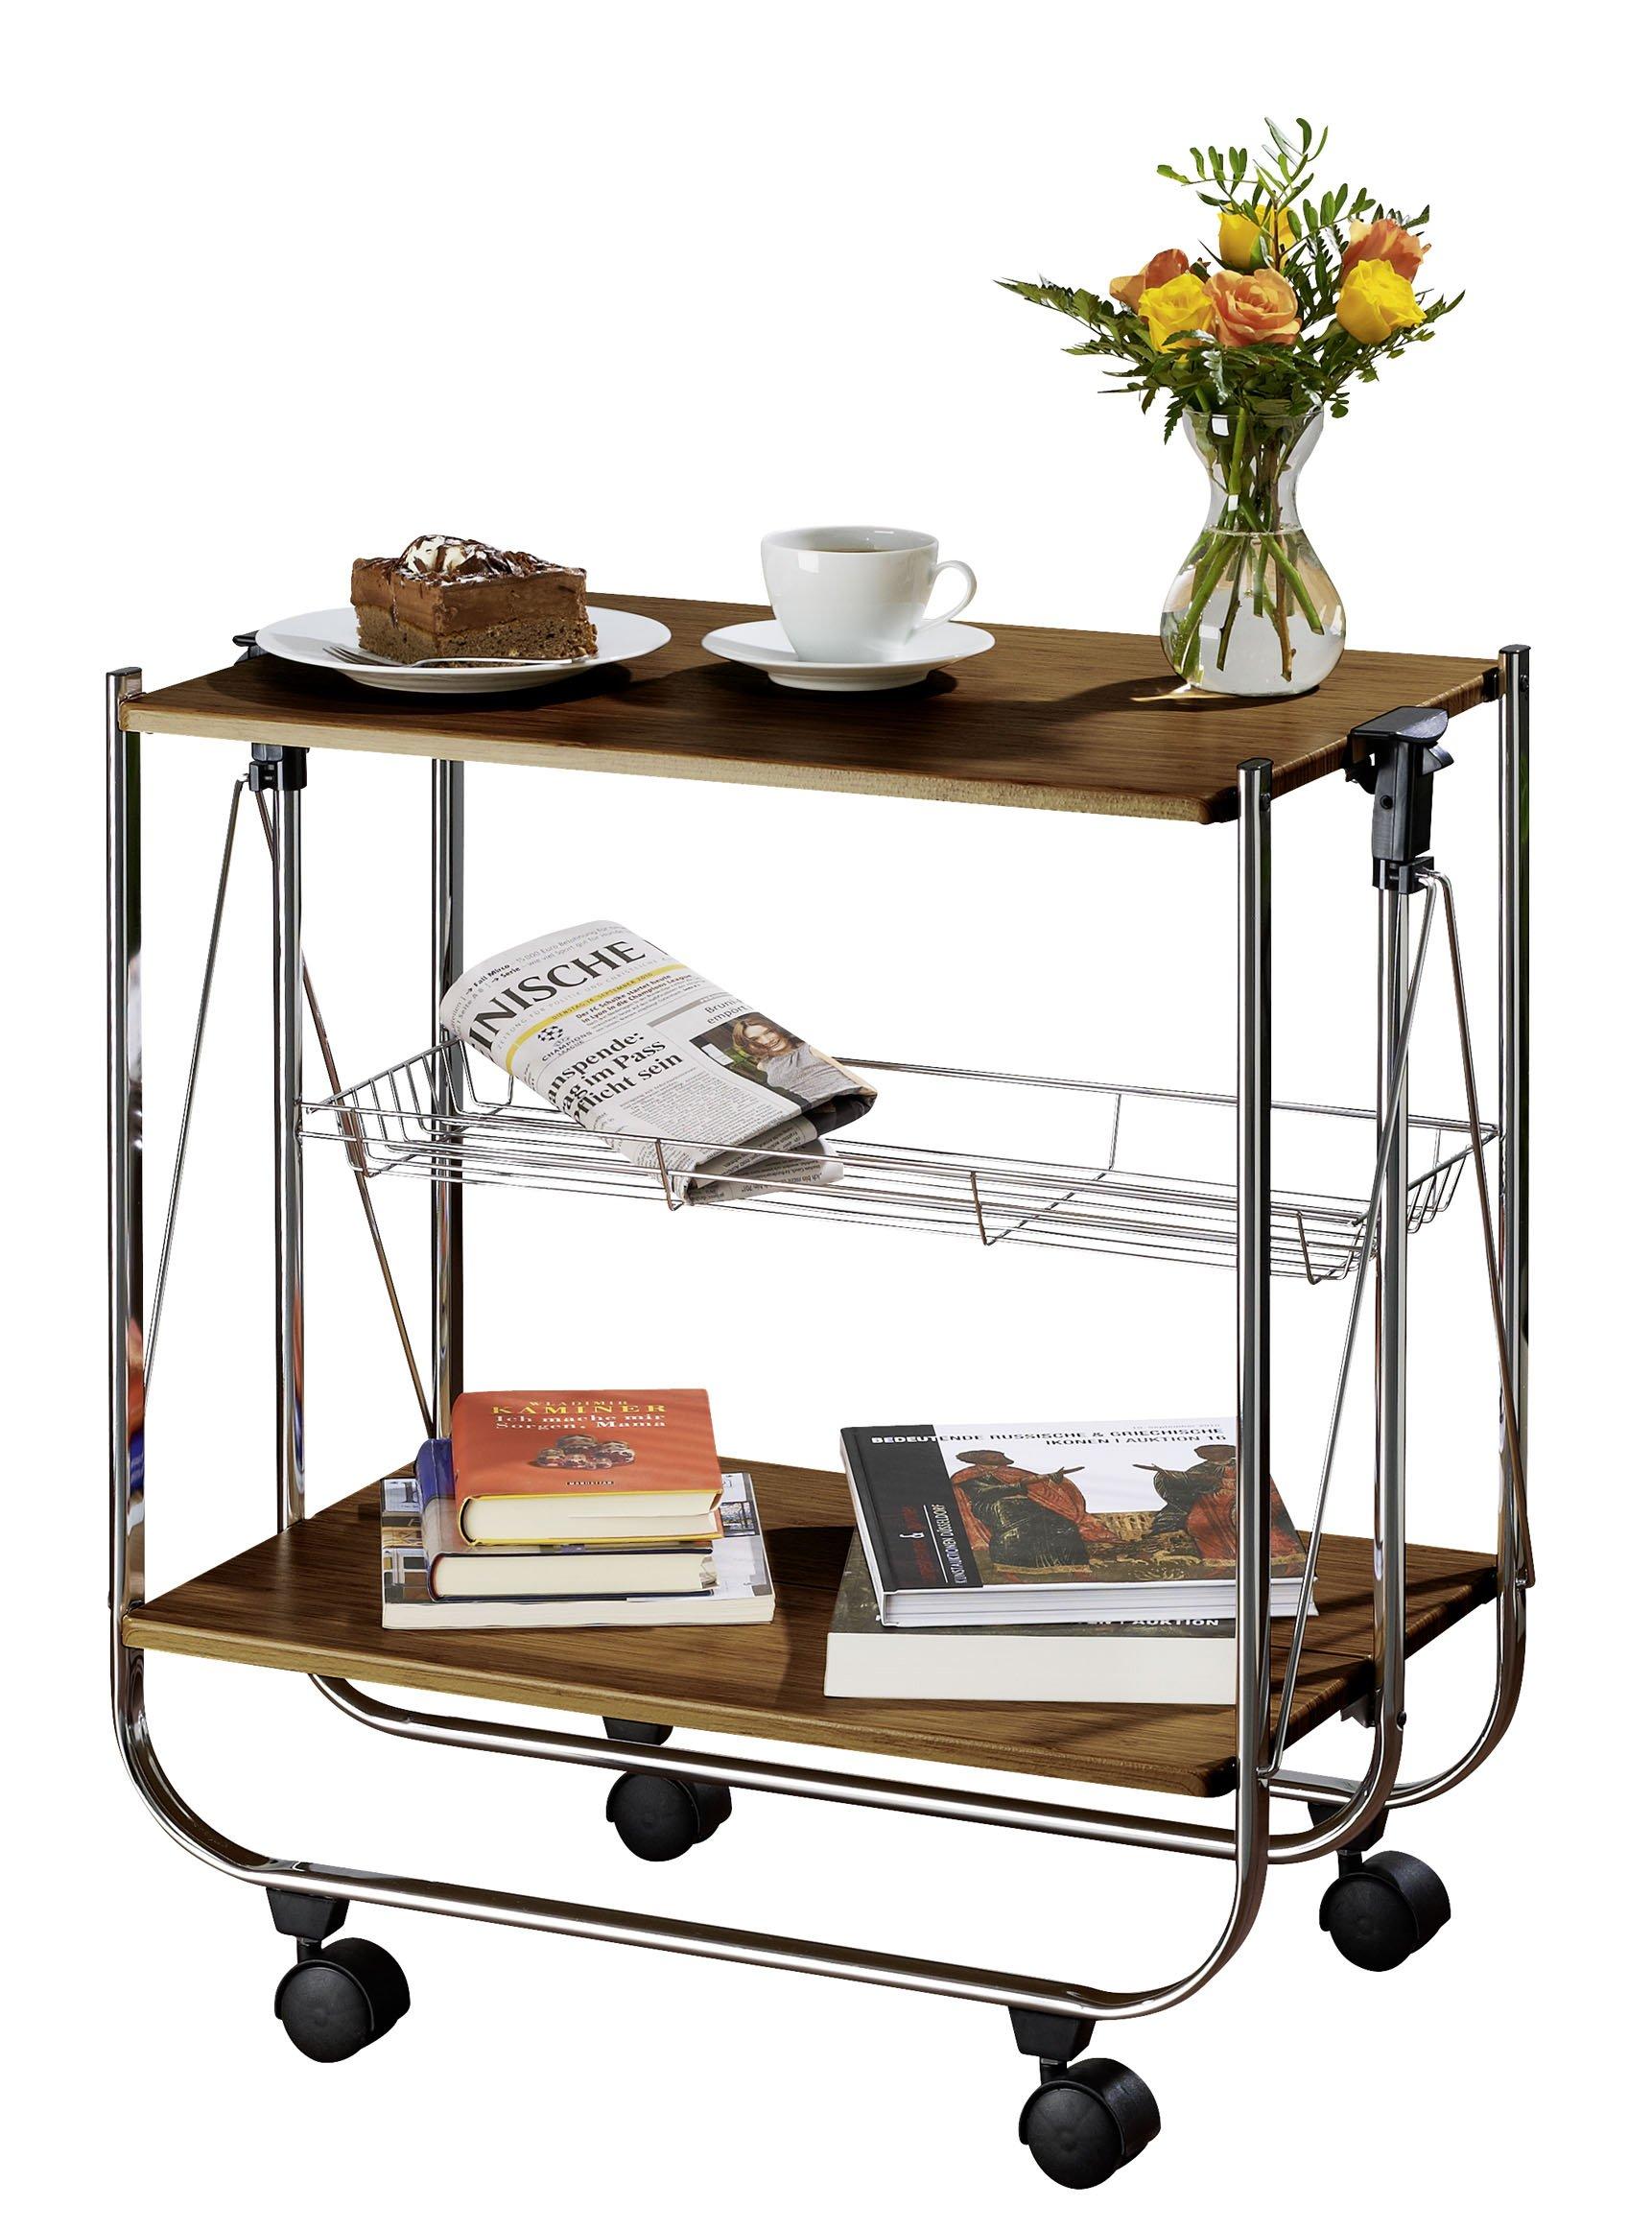 WENKO 713003100 Catering trolley Dinett Walnut - foldable, MDF, 26.8 x 27.6 x 16 inch, Shiny